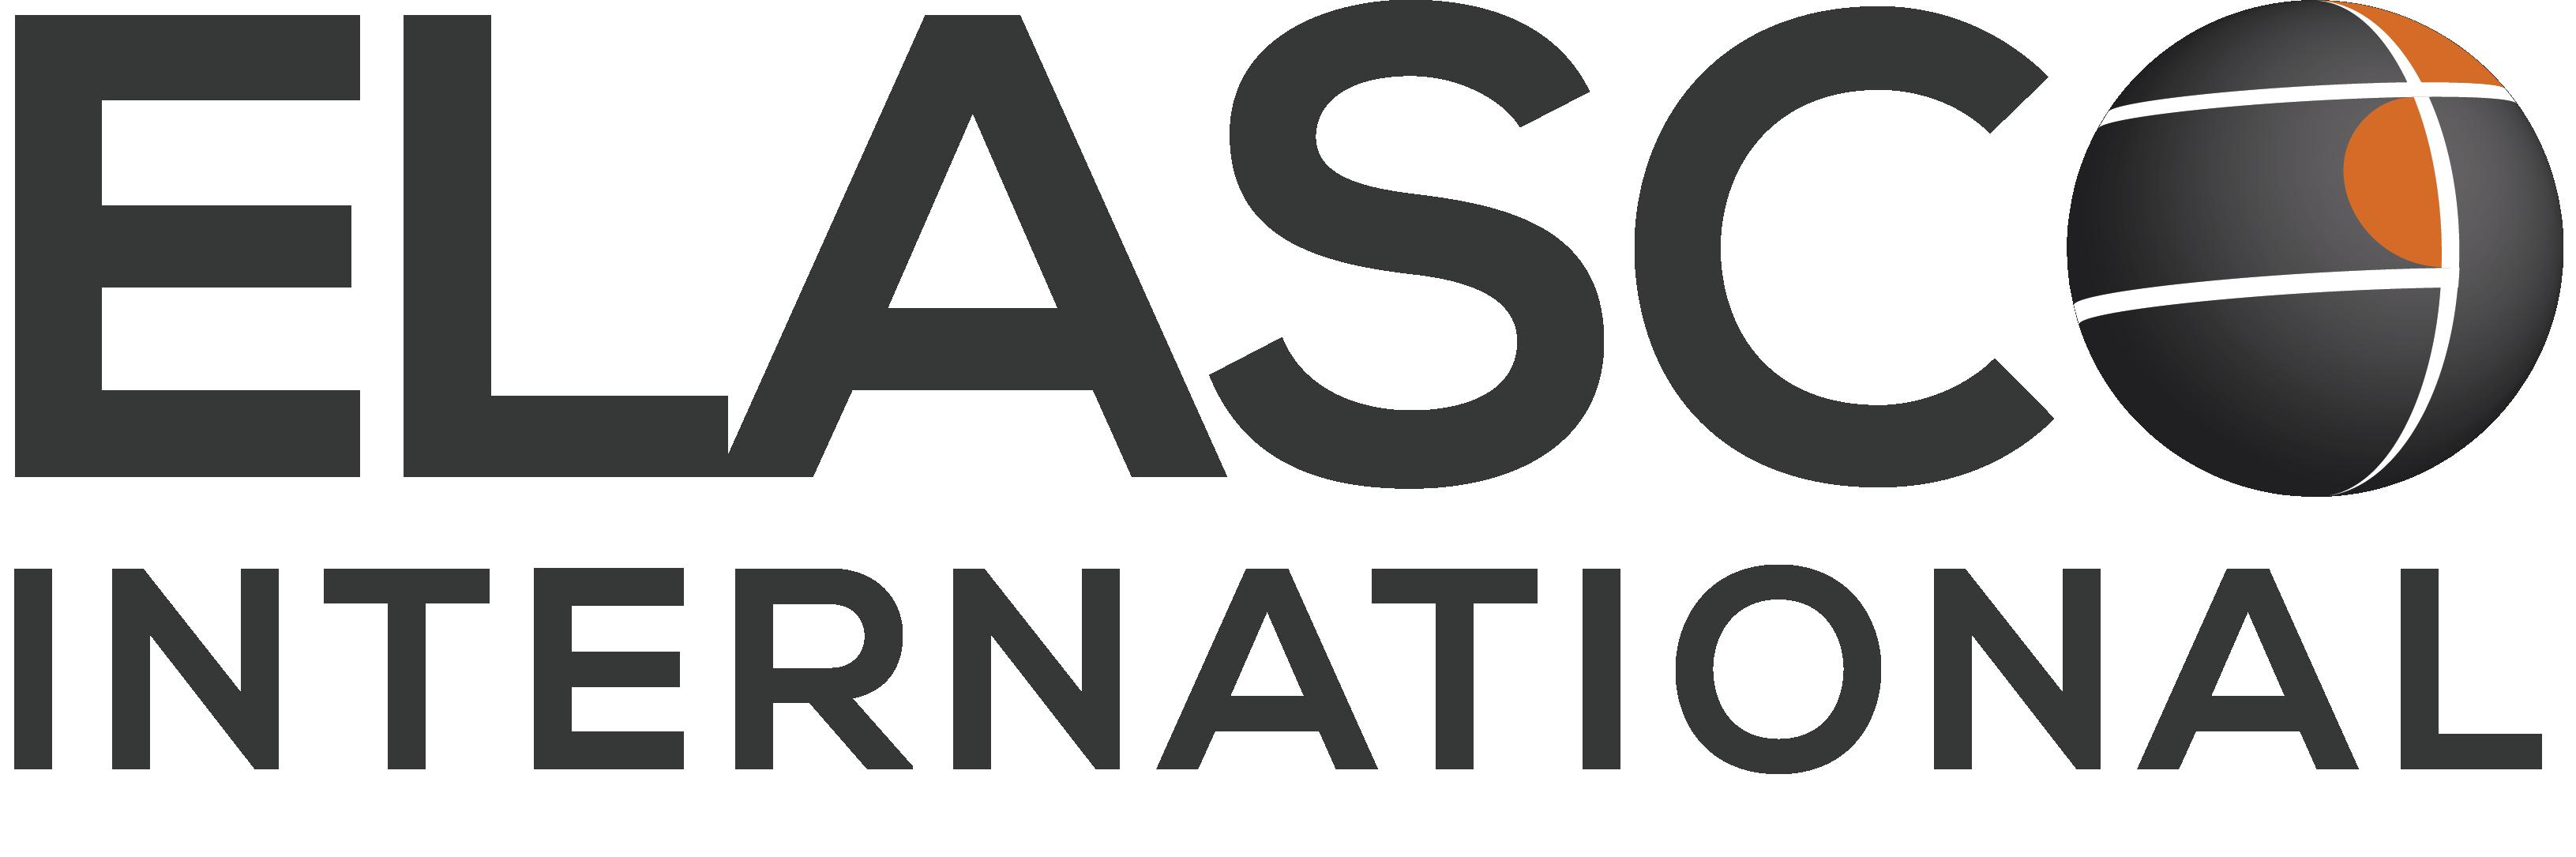 Elasco International Corporation